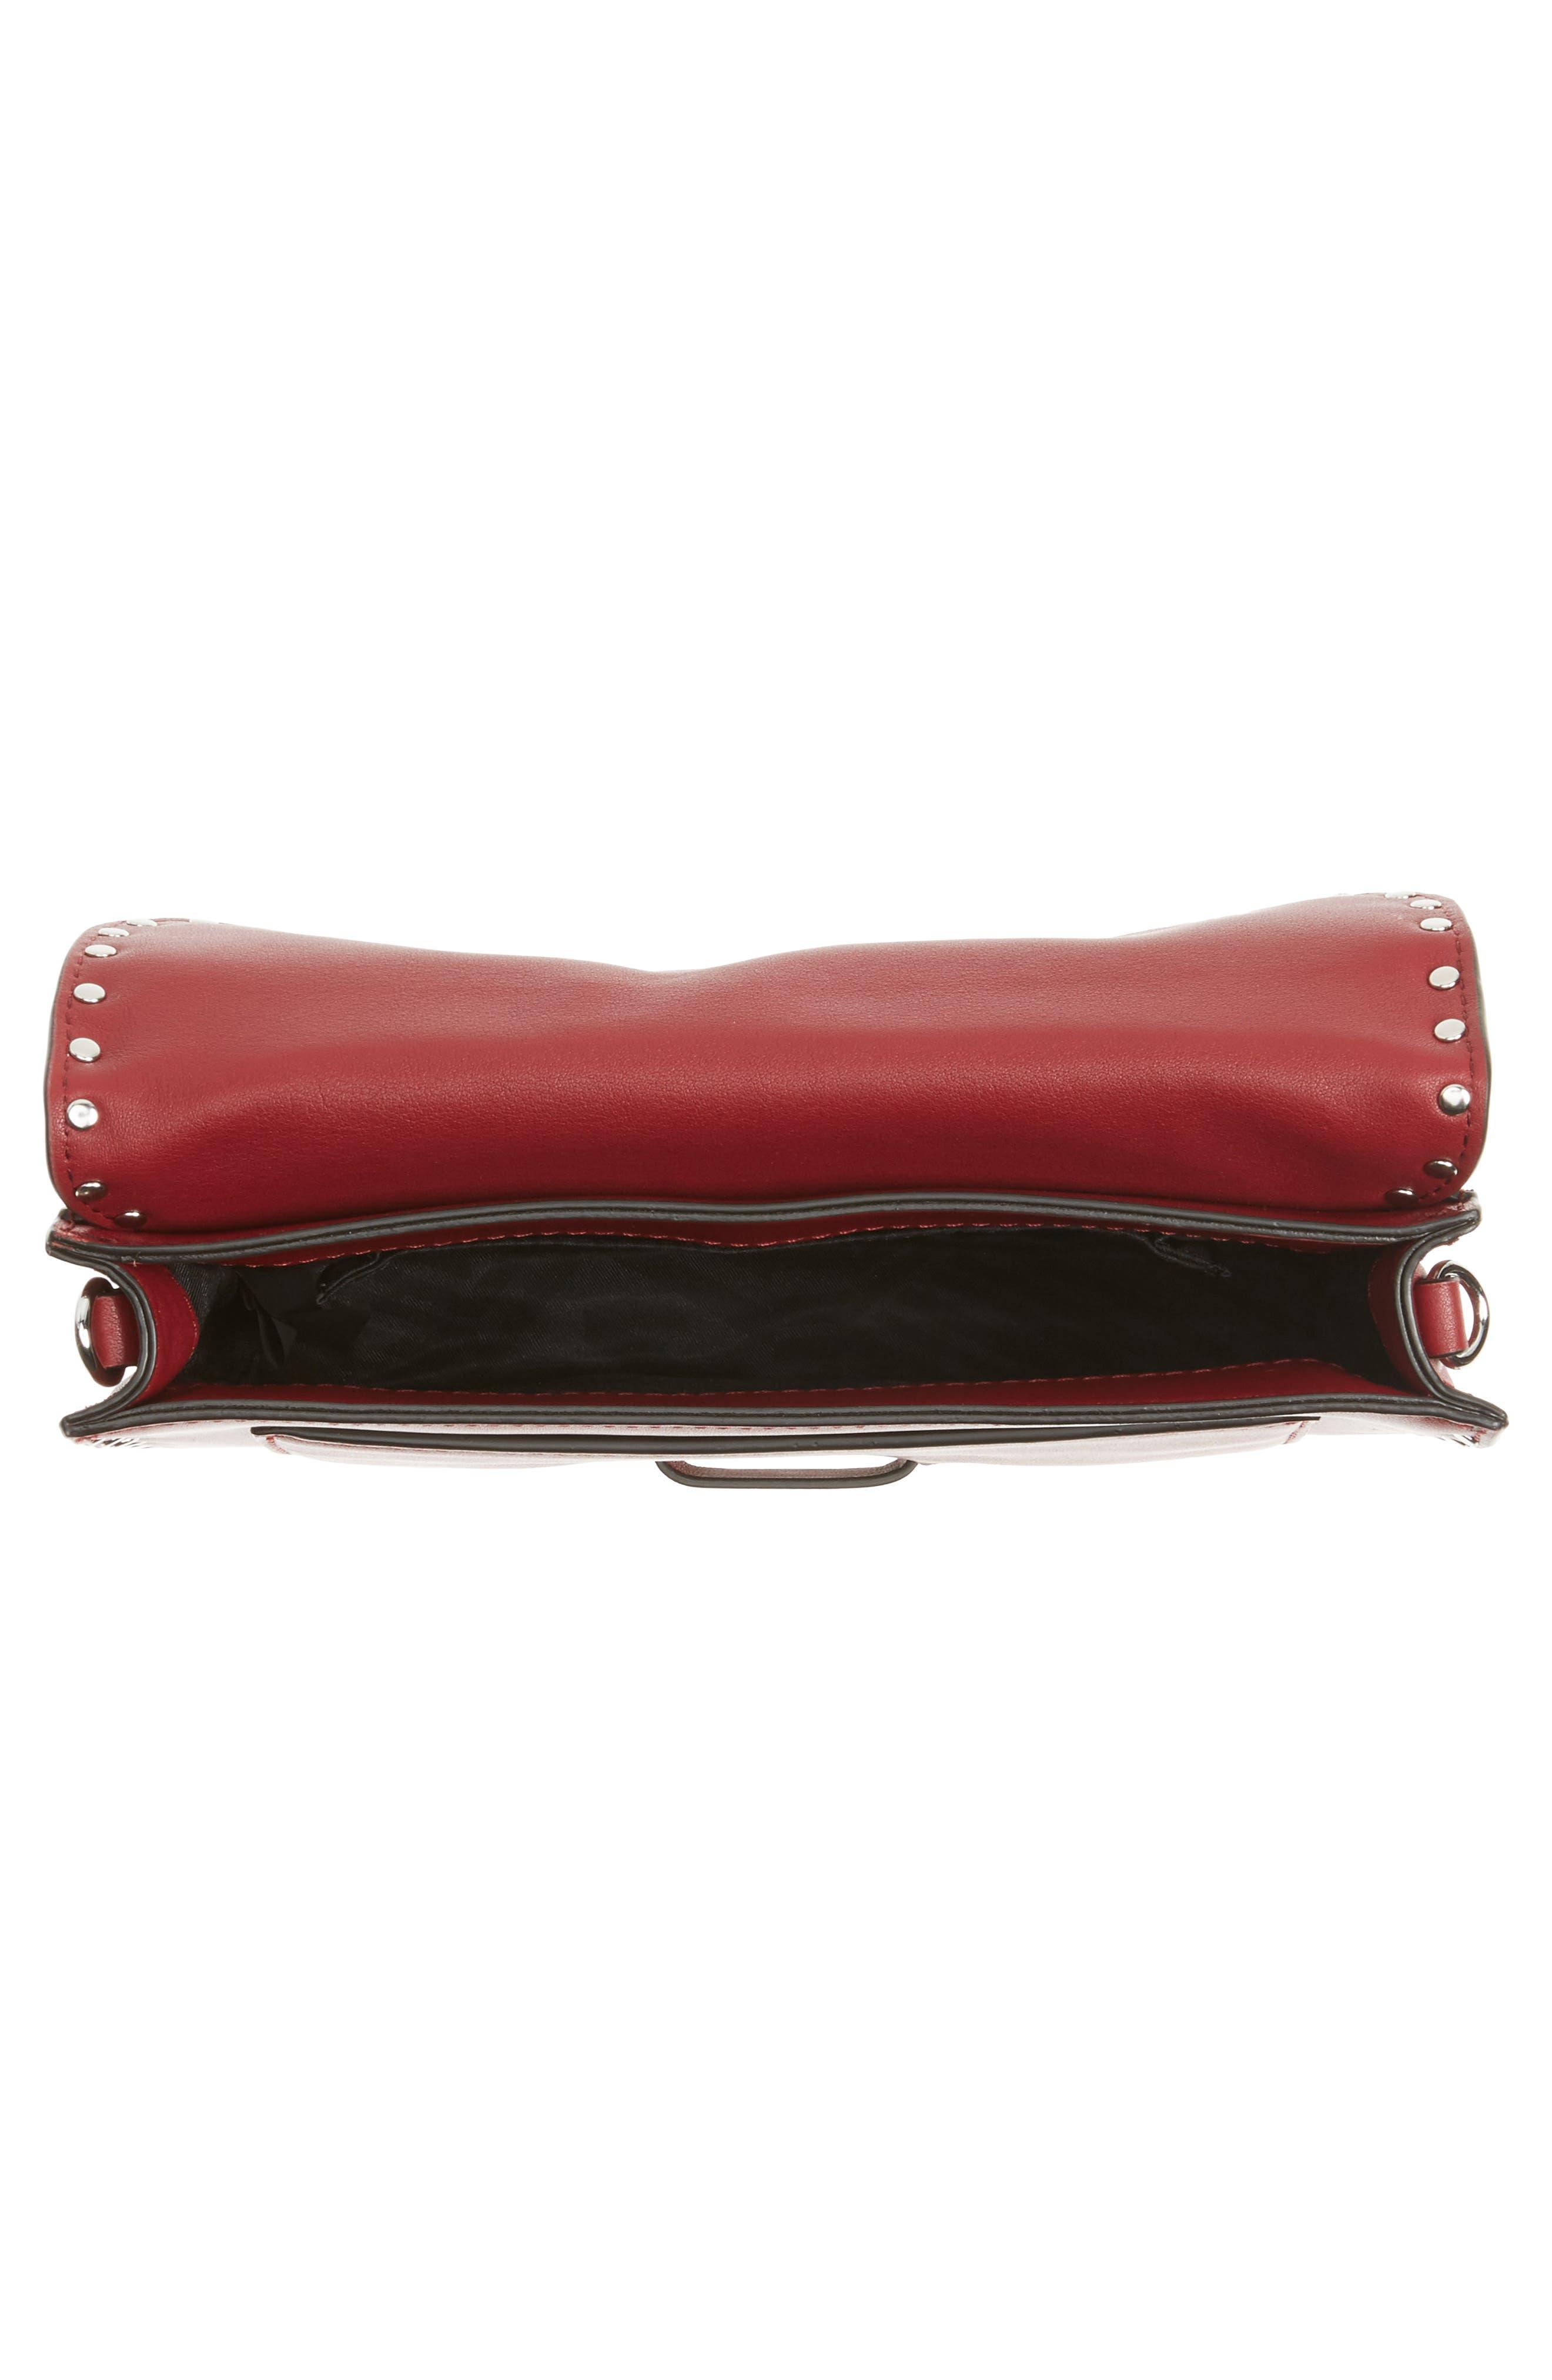 Medium Midnighter Leather Crossbody Bag,                             Alternate thumbnail 4, color,                             Acai